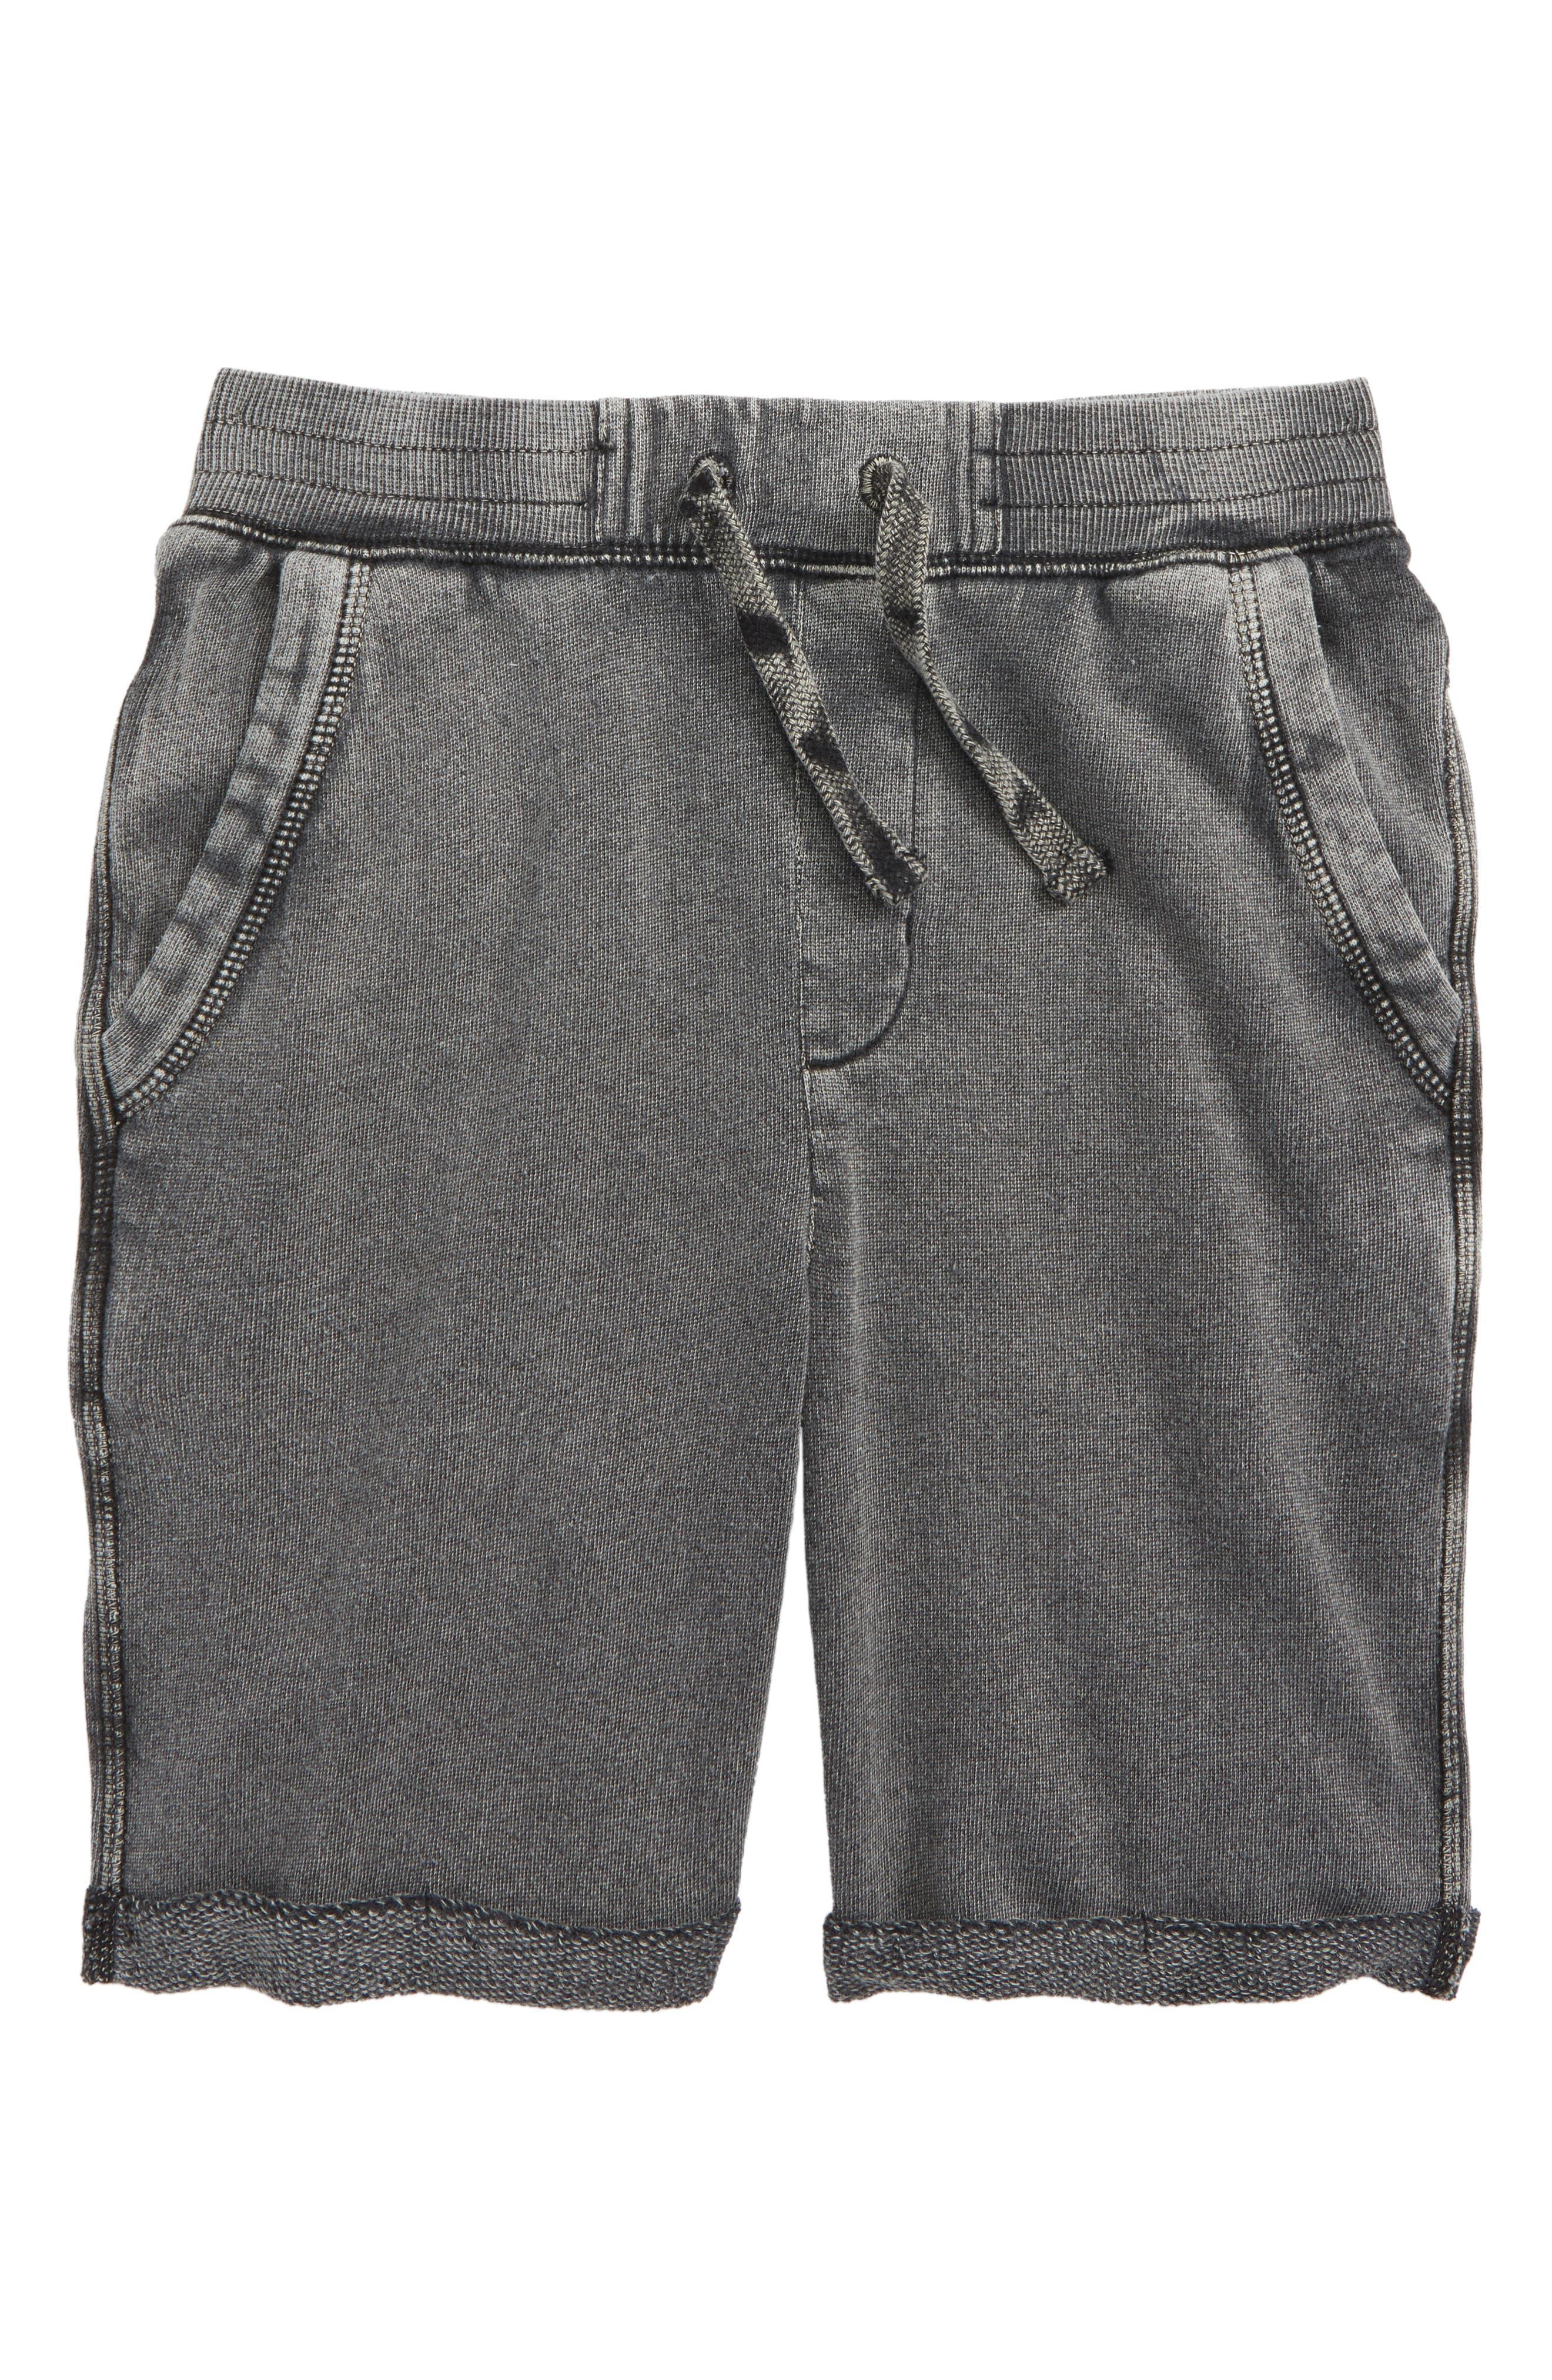 Fleece Shorts,                         Main,                         color, Black